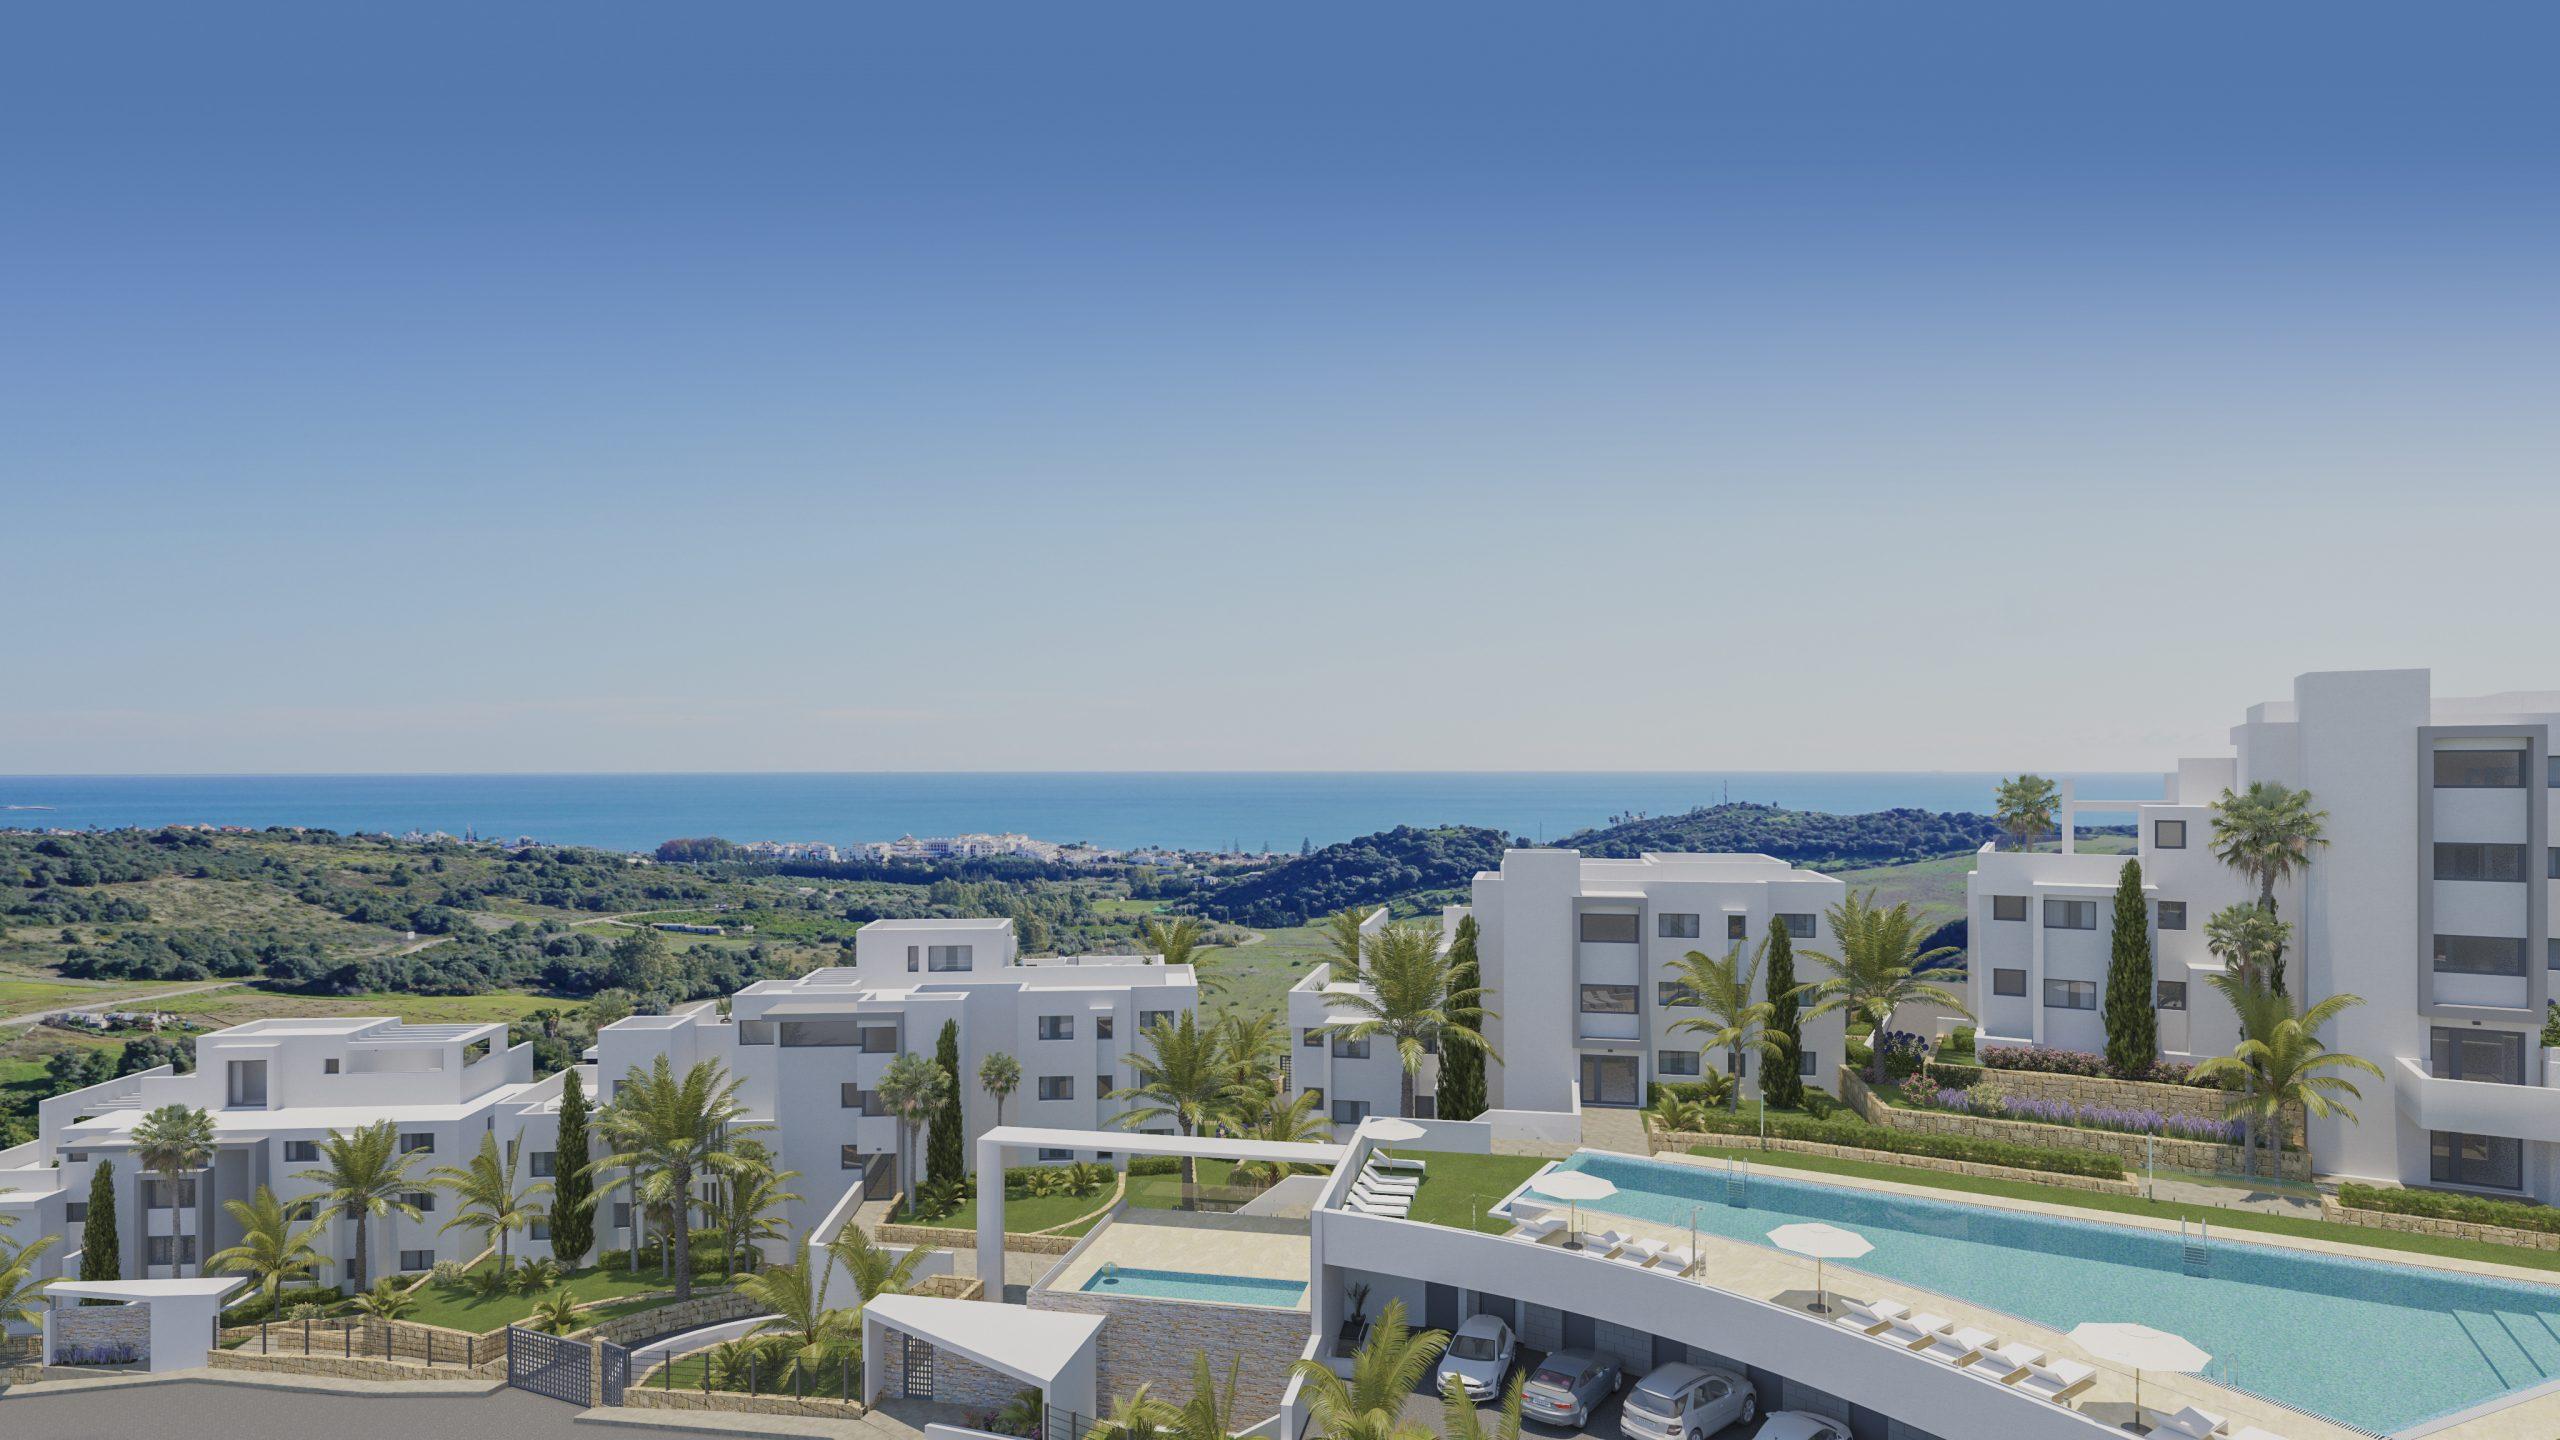 Ground Floor 2 bedroom Apartment – Estepona Golf, Estepona – For Sale